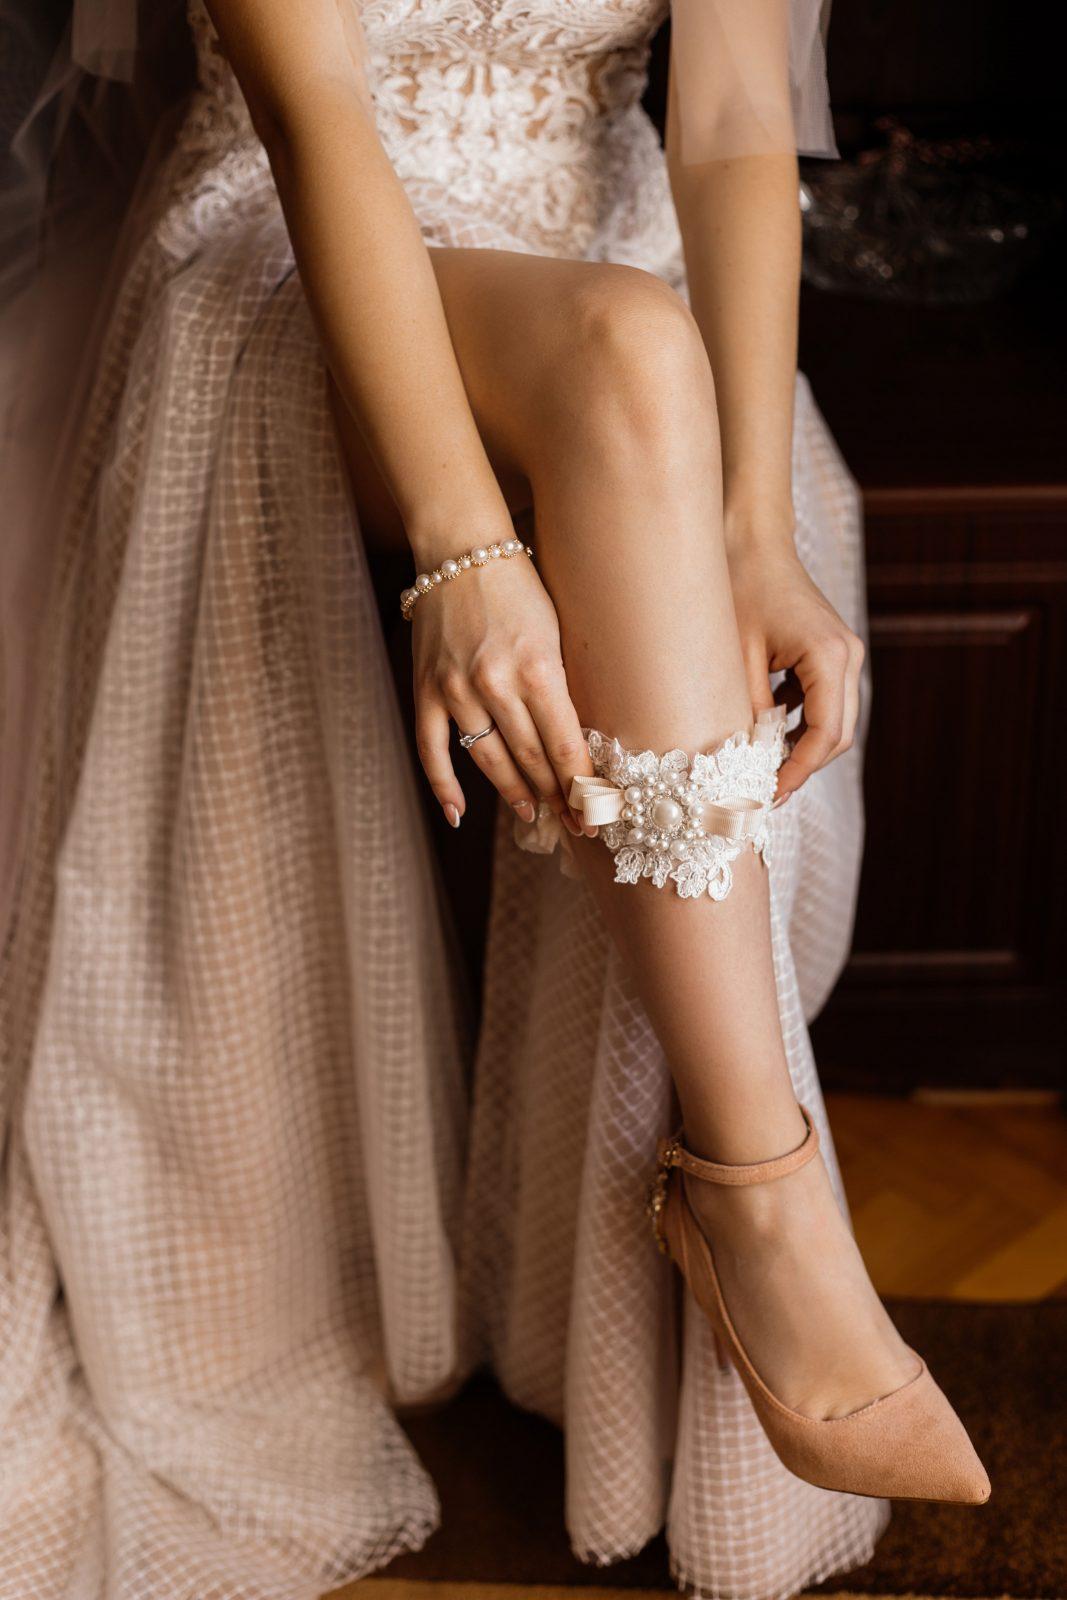 bride puts wedding garter on right leg